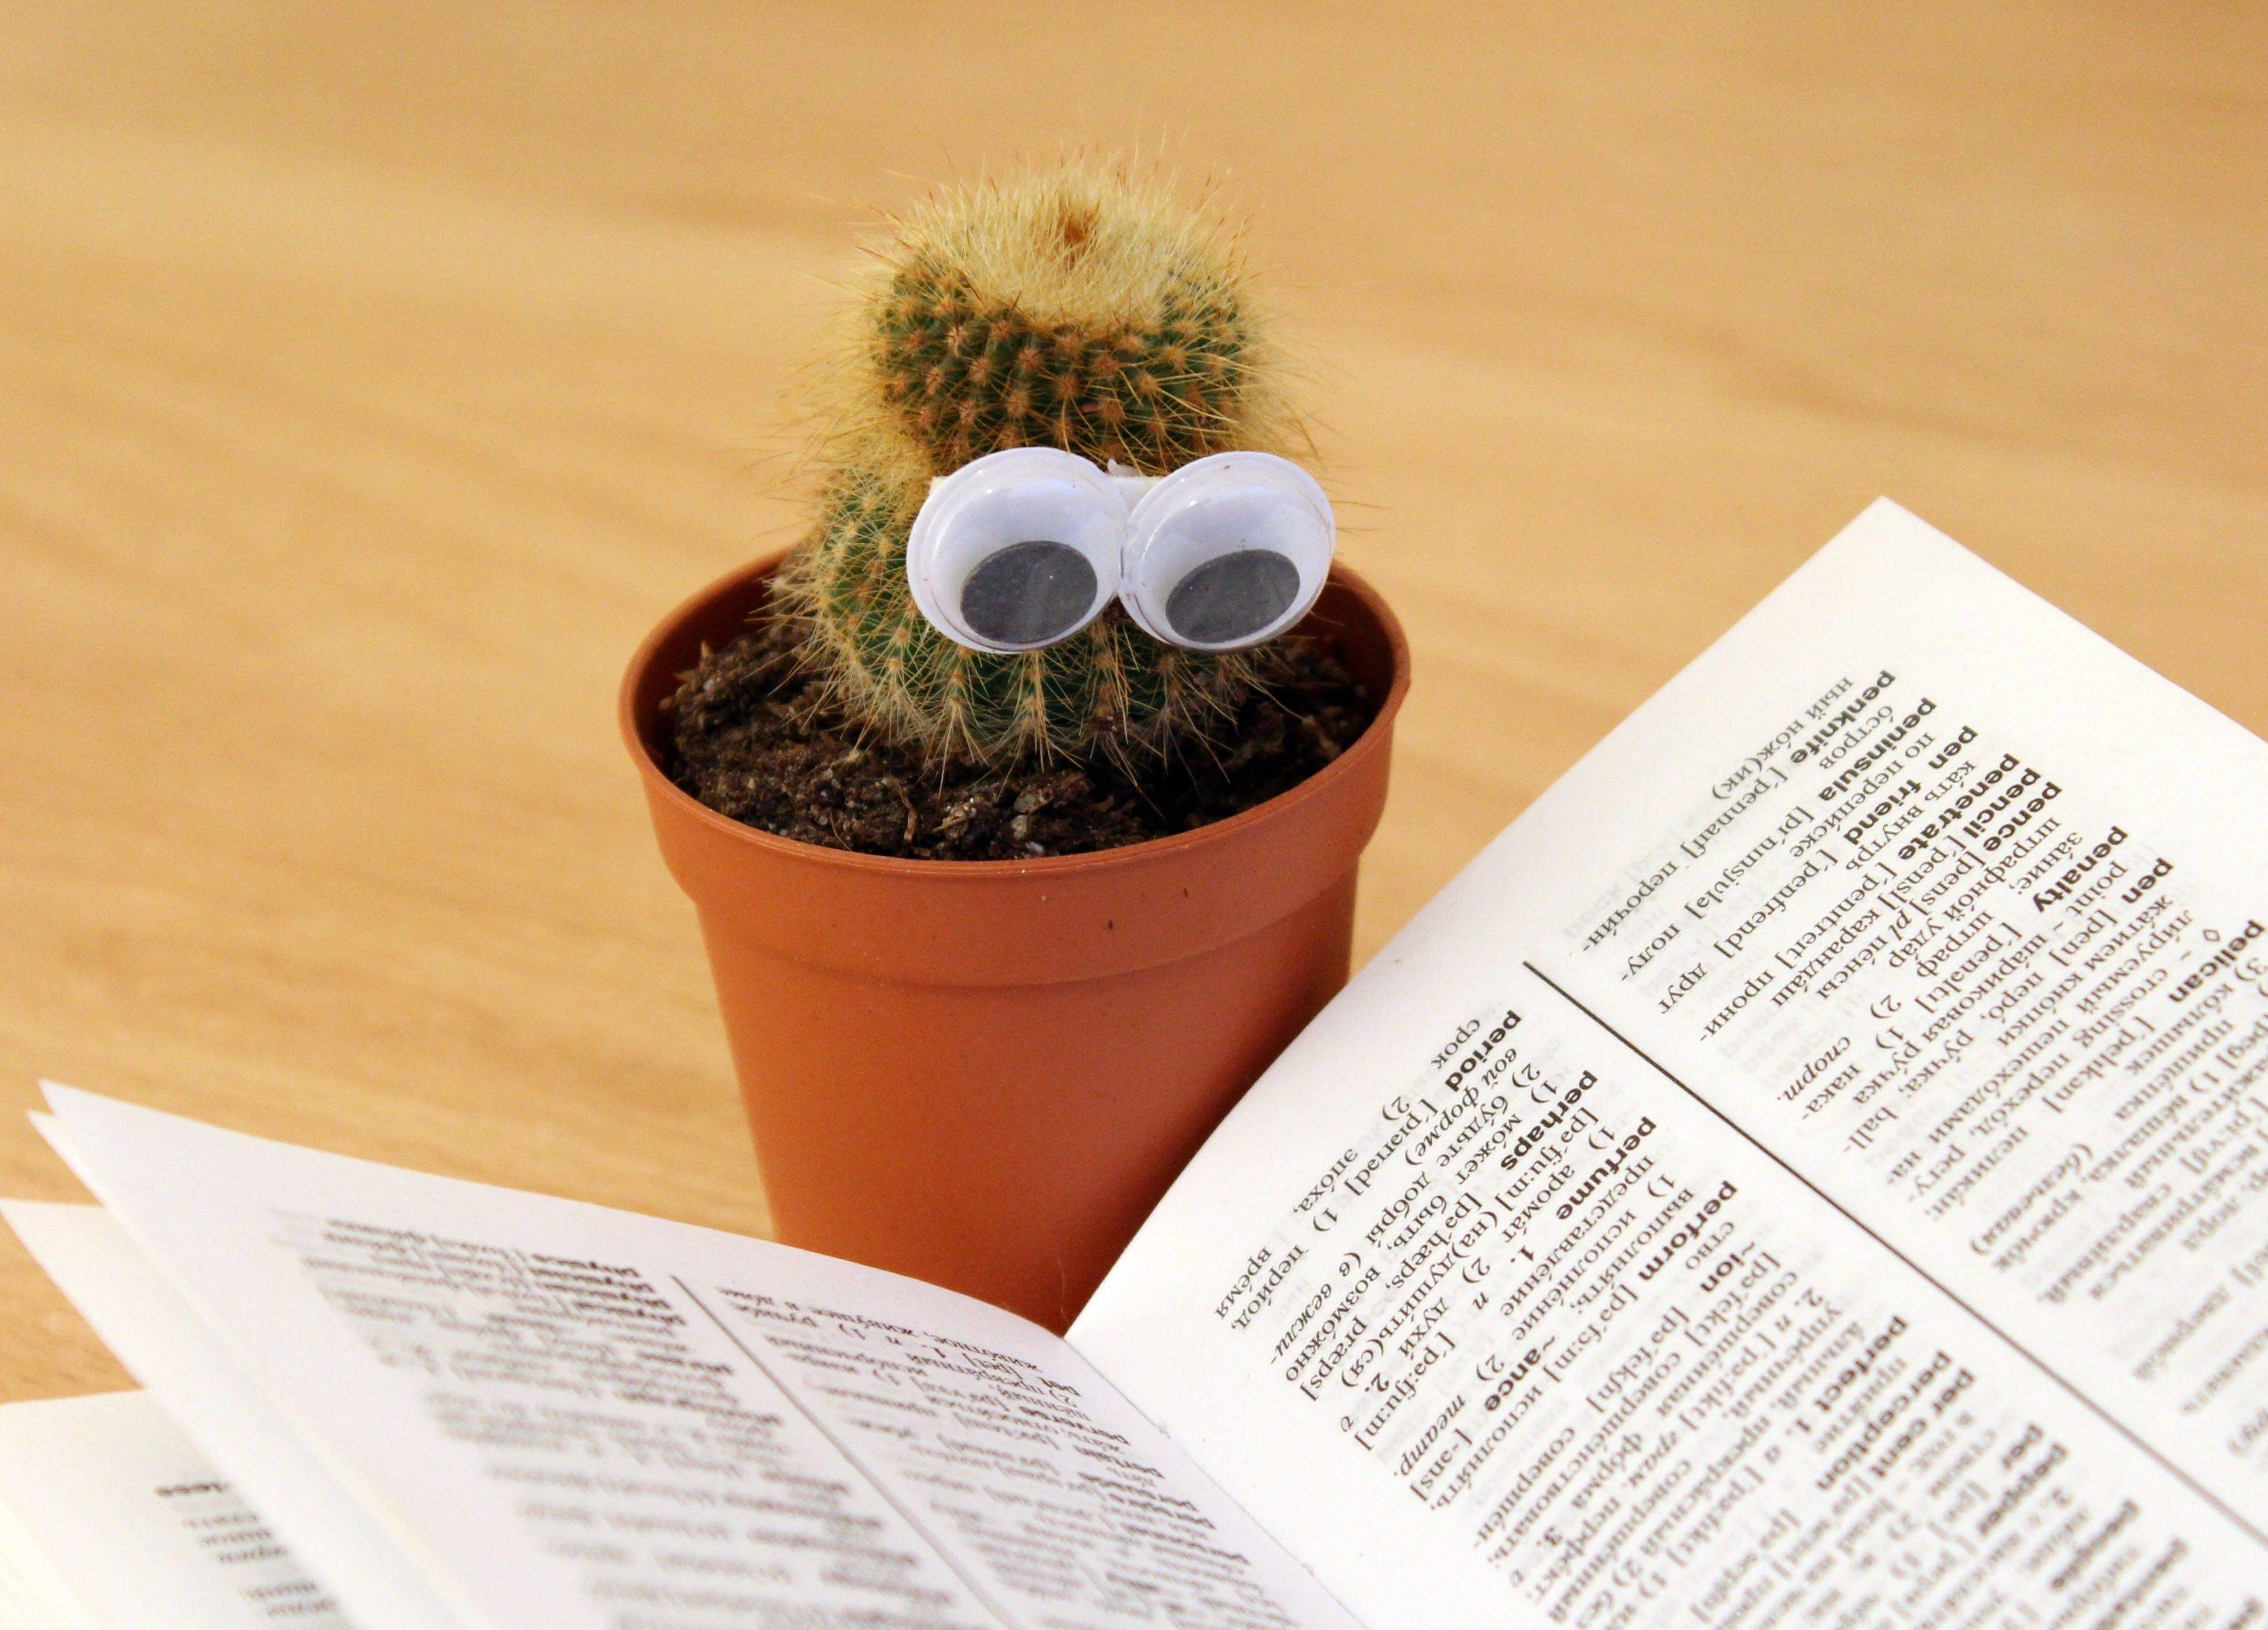 Green Cactus Beside White Book